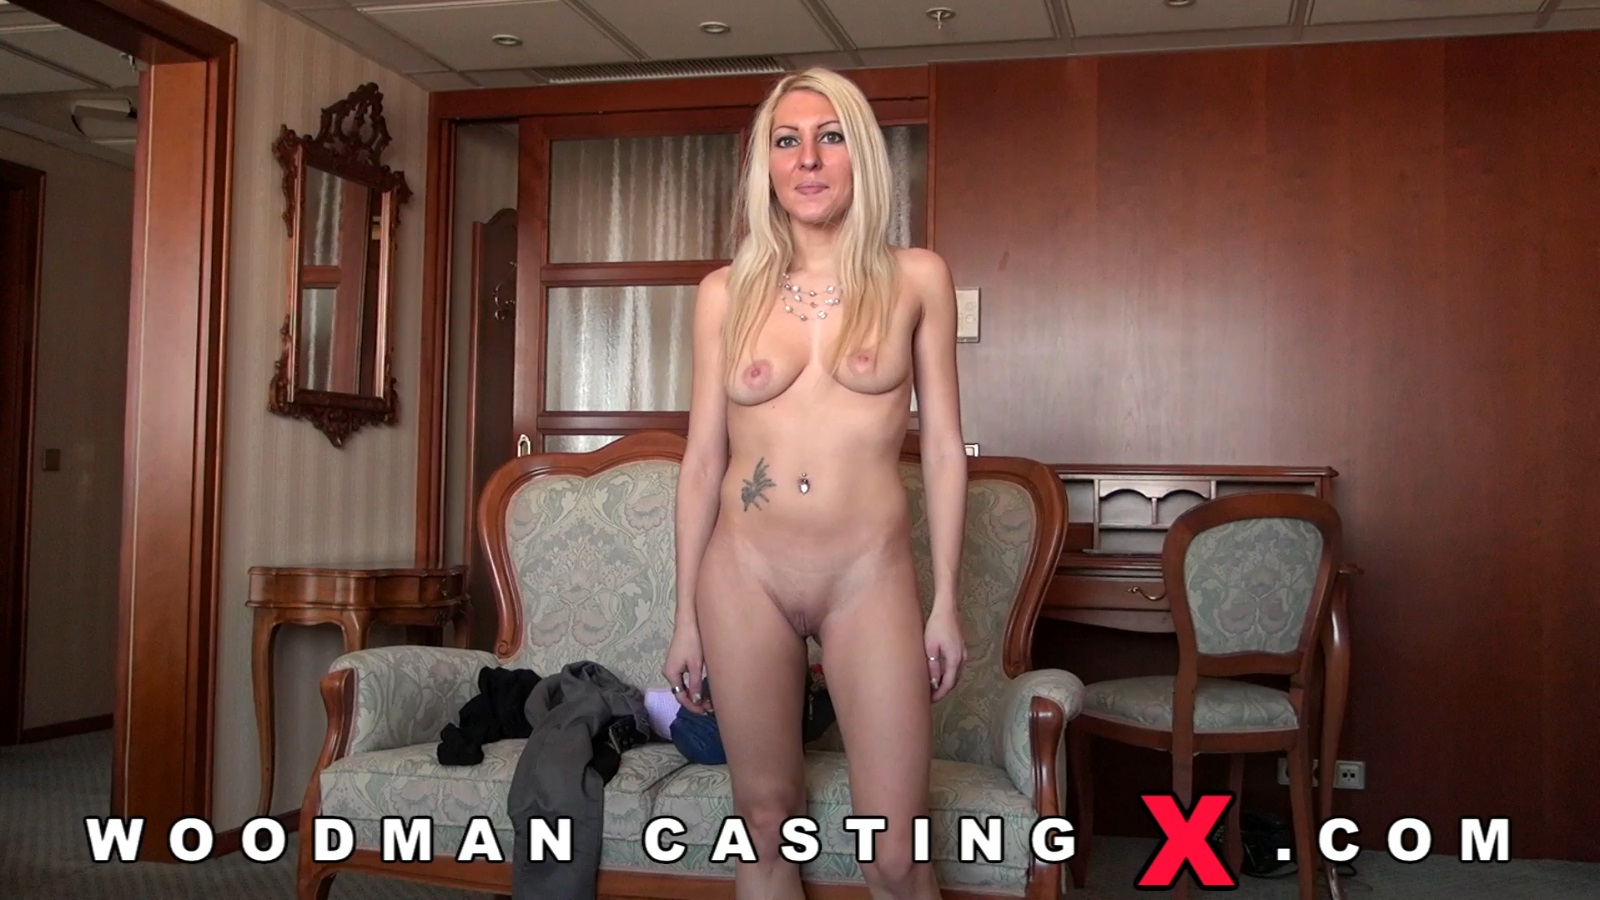 Woodman Castingx